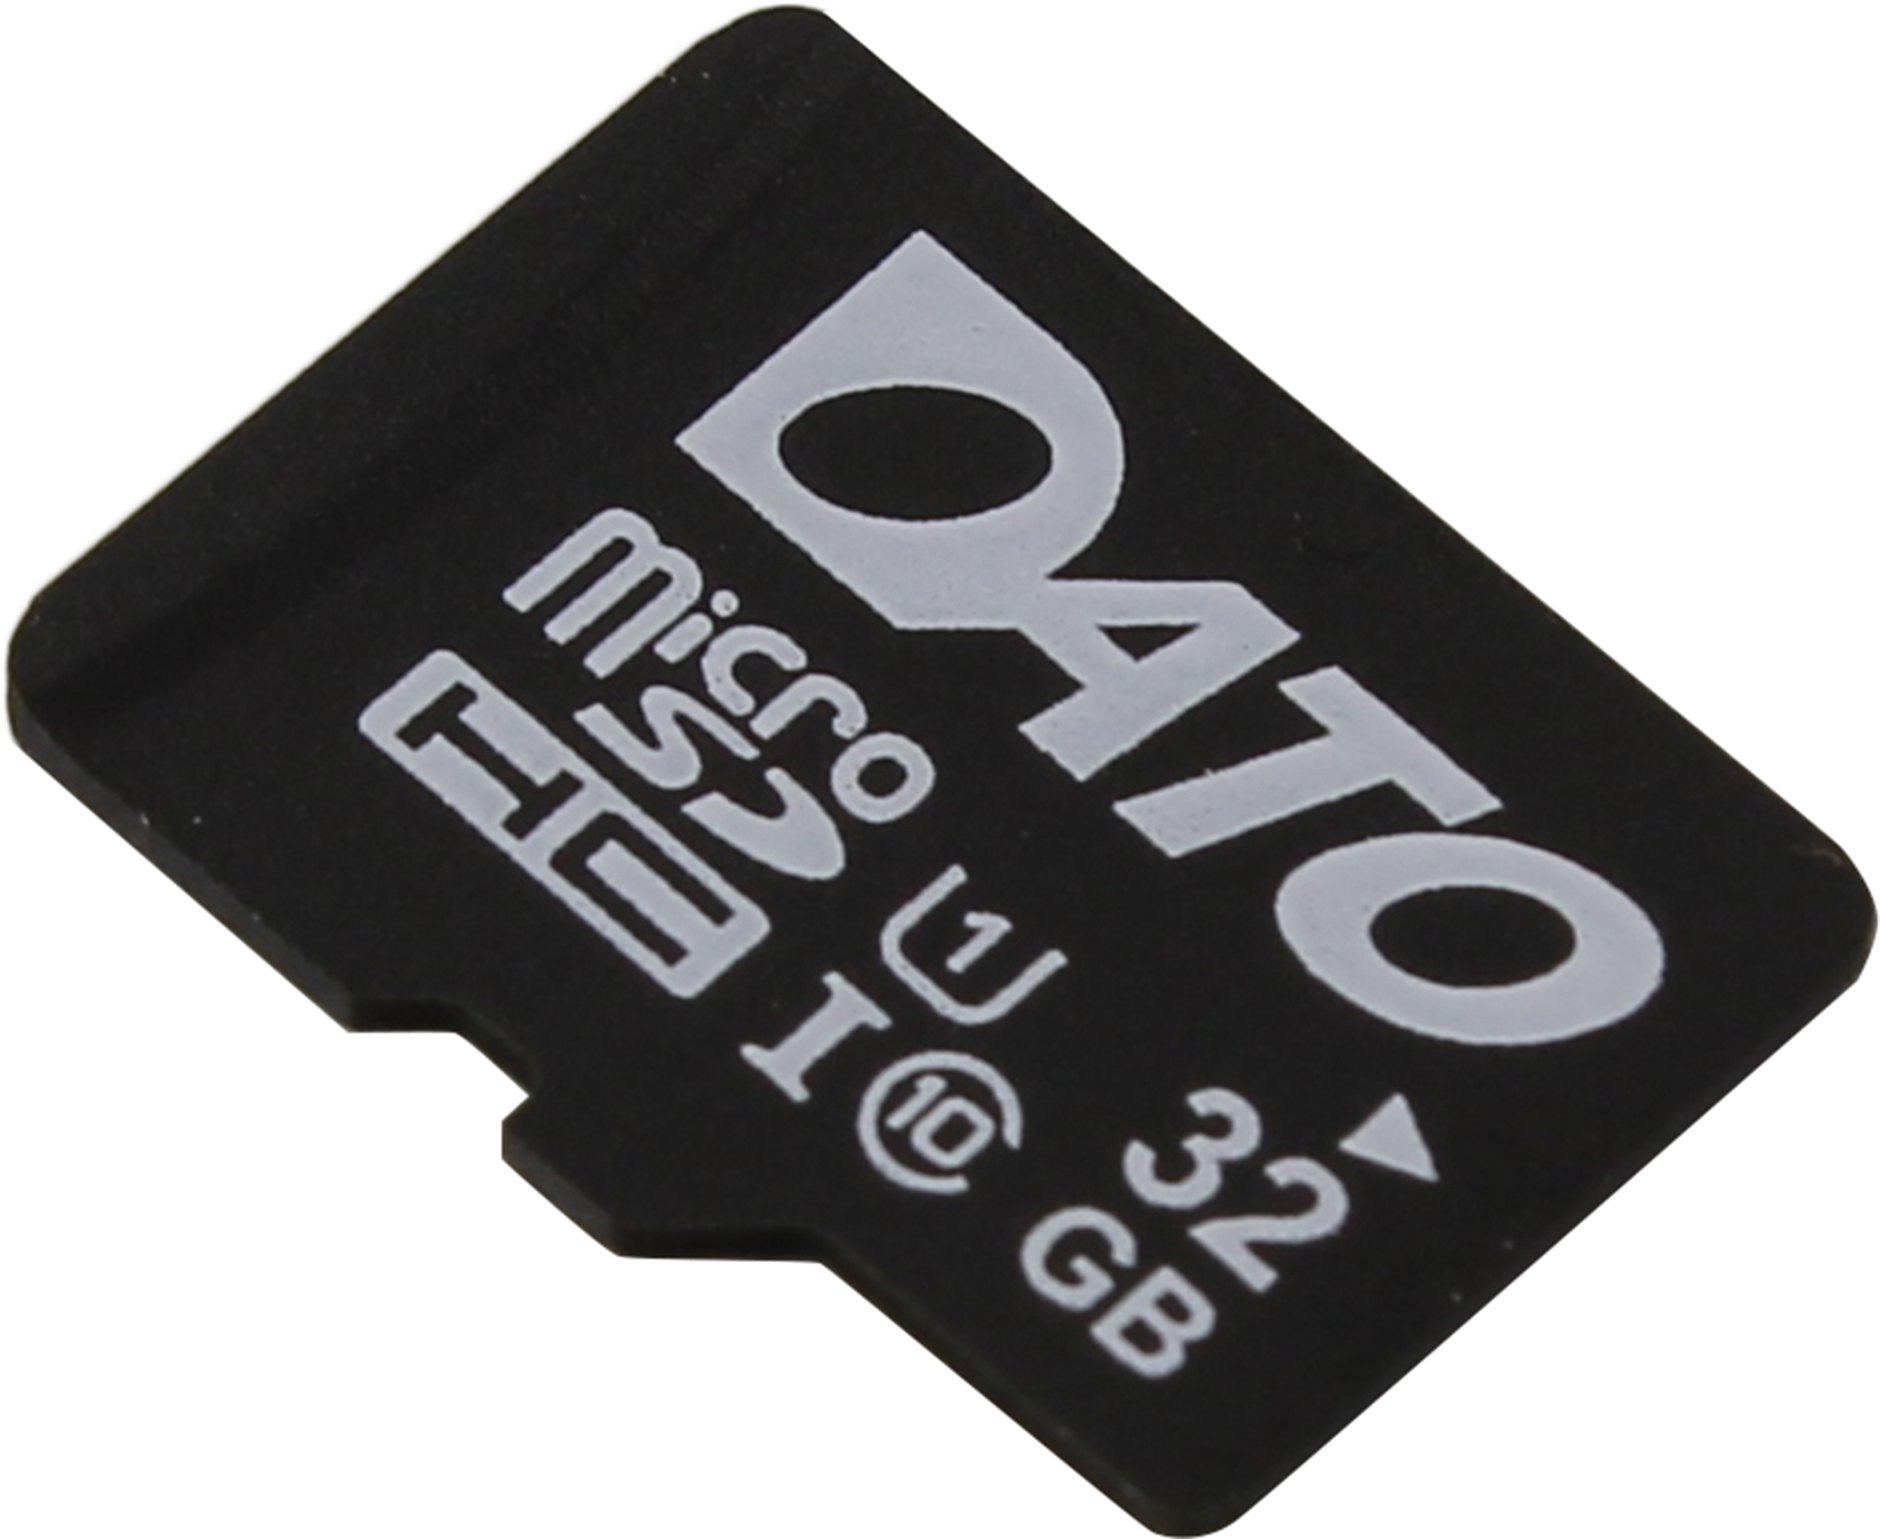 DATO microSDHC Class 10 UHS-I U1